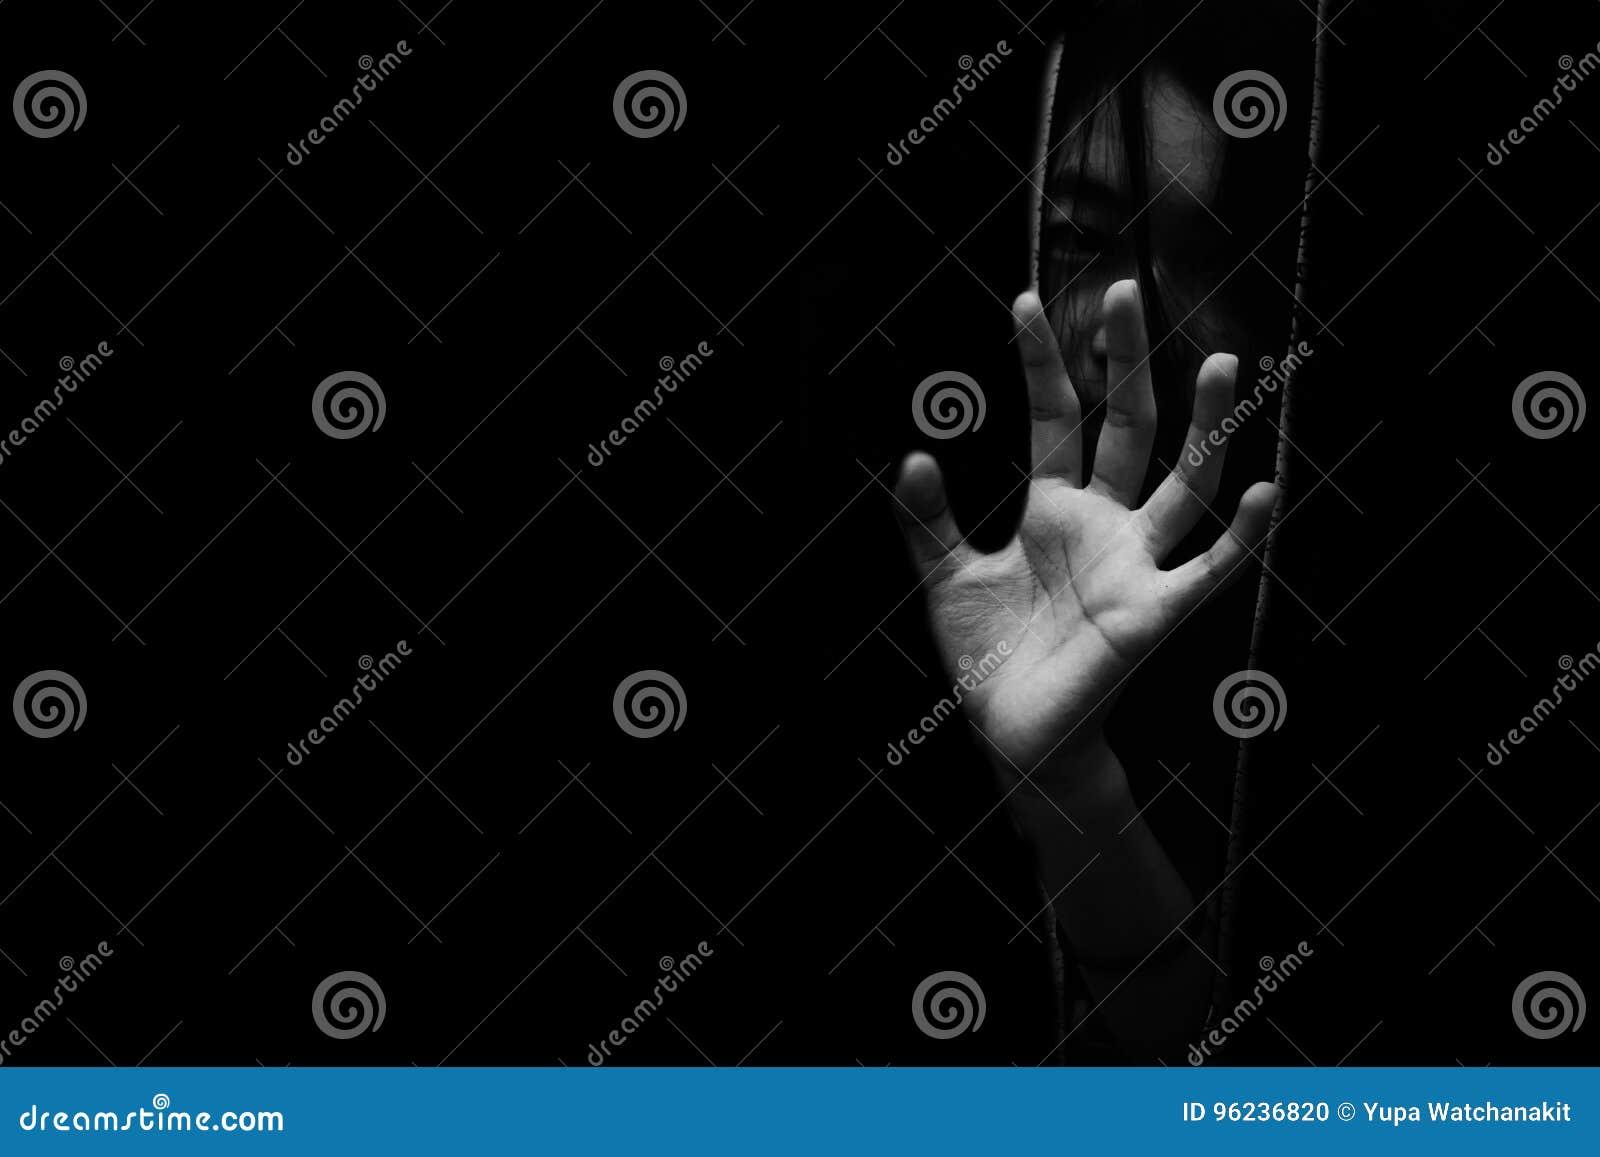 Playful black little girl hiding in closet · Free Stock Photo